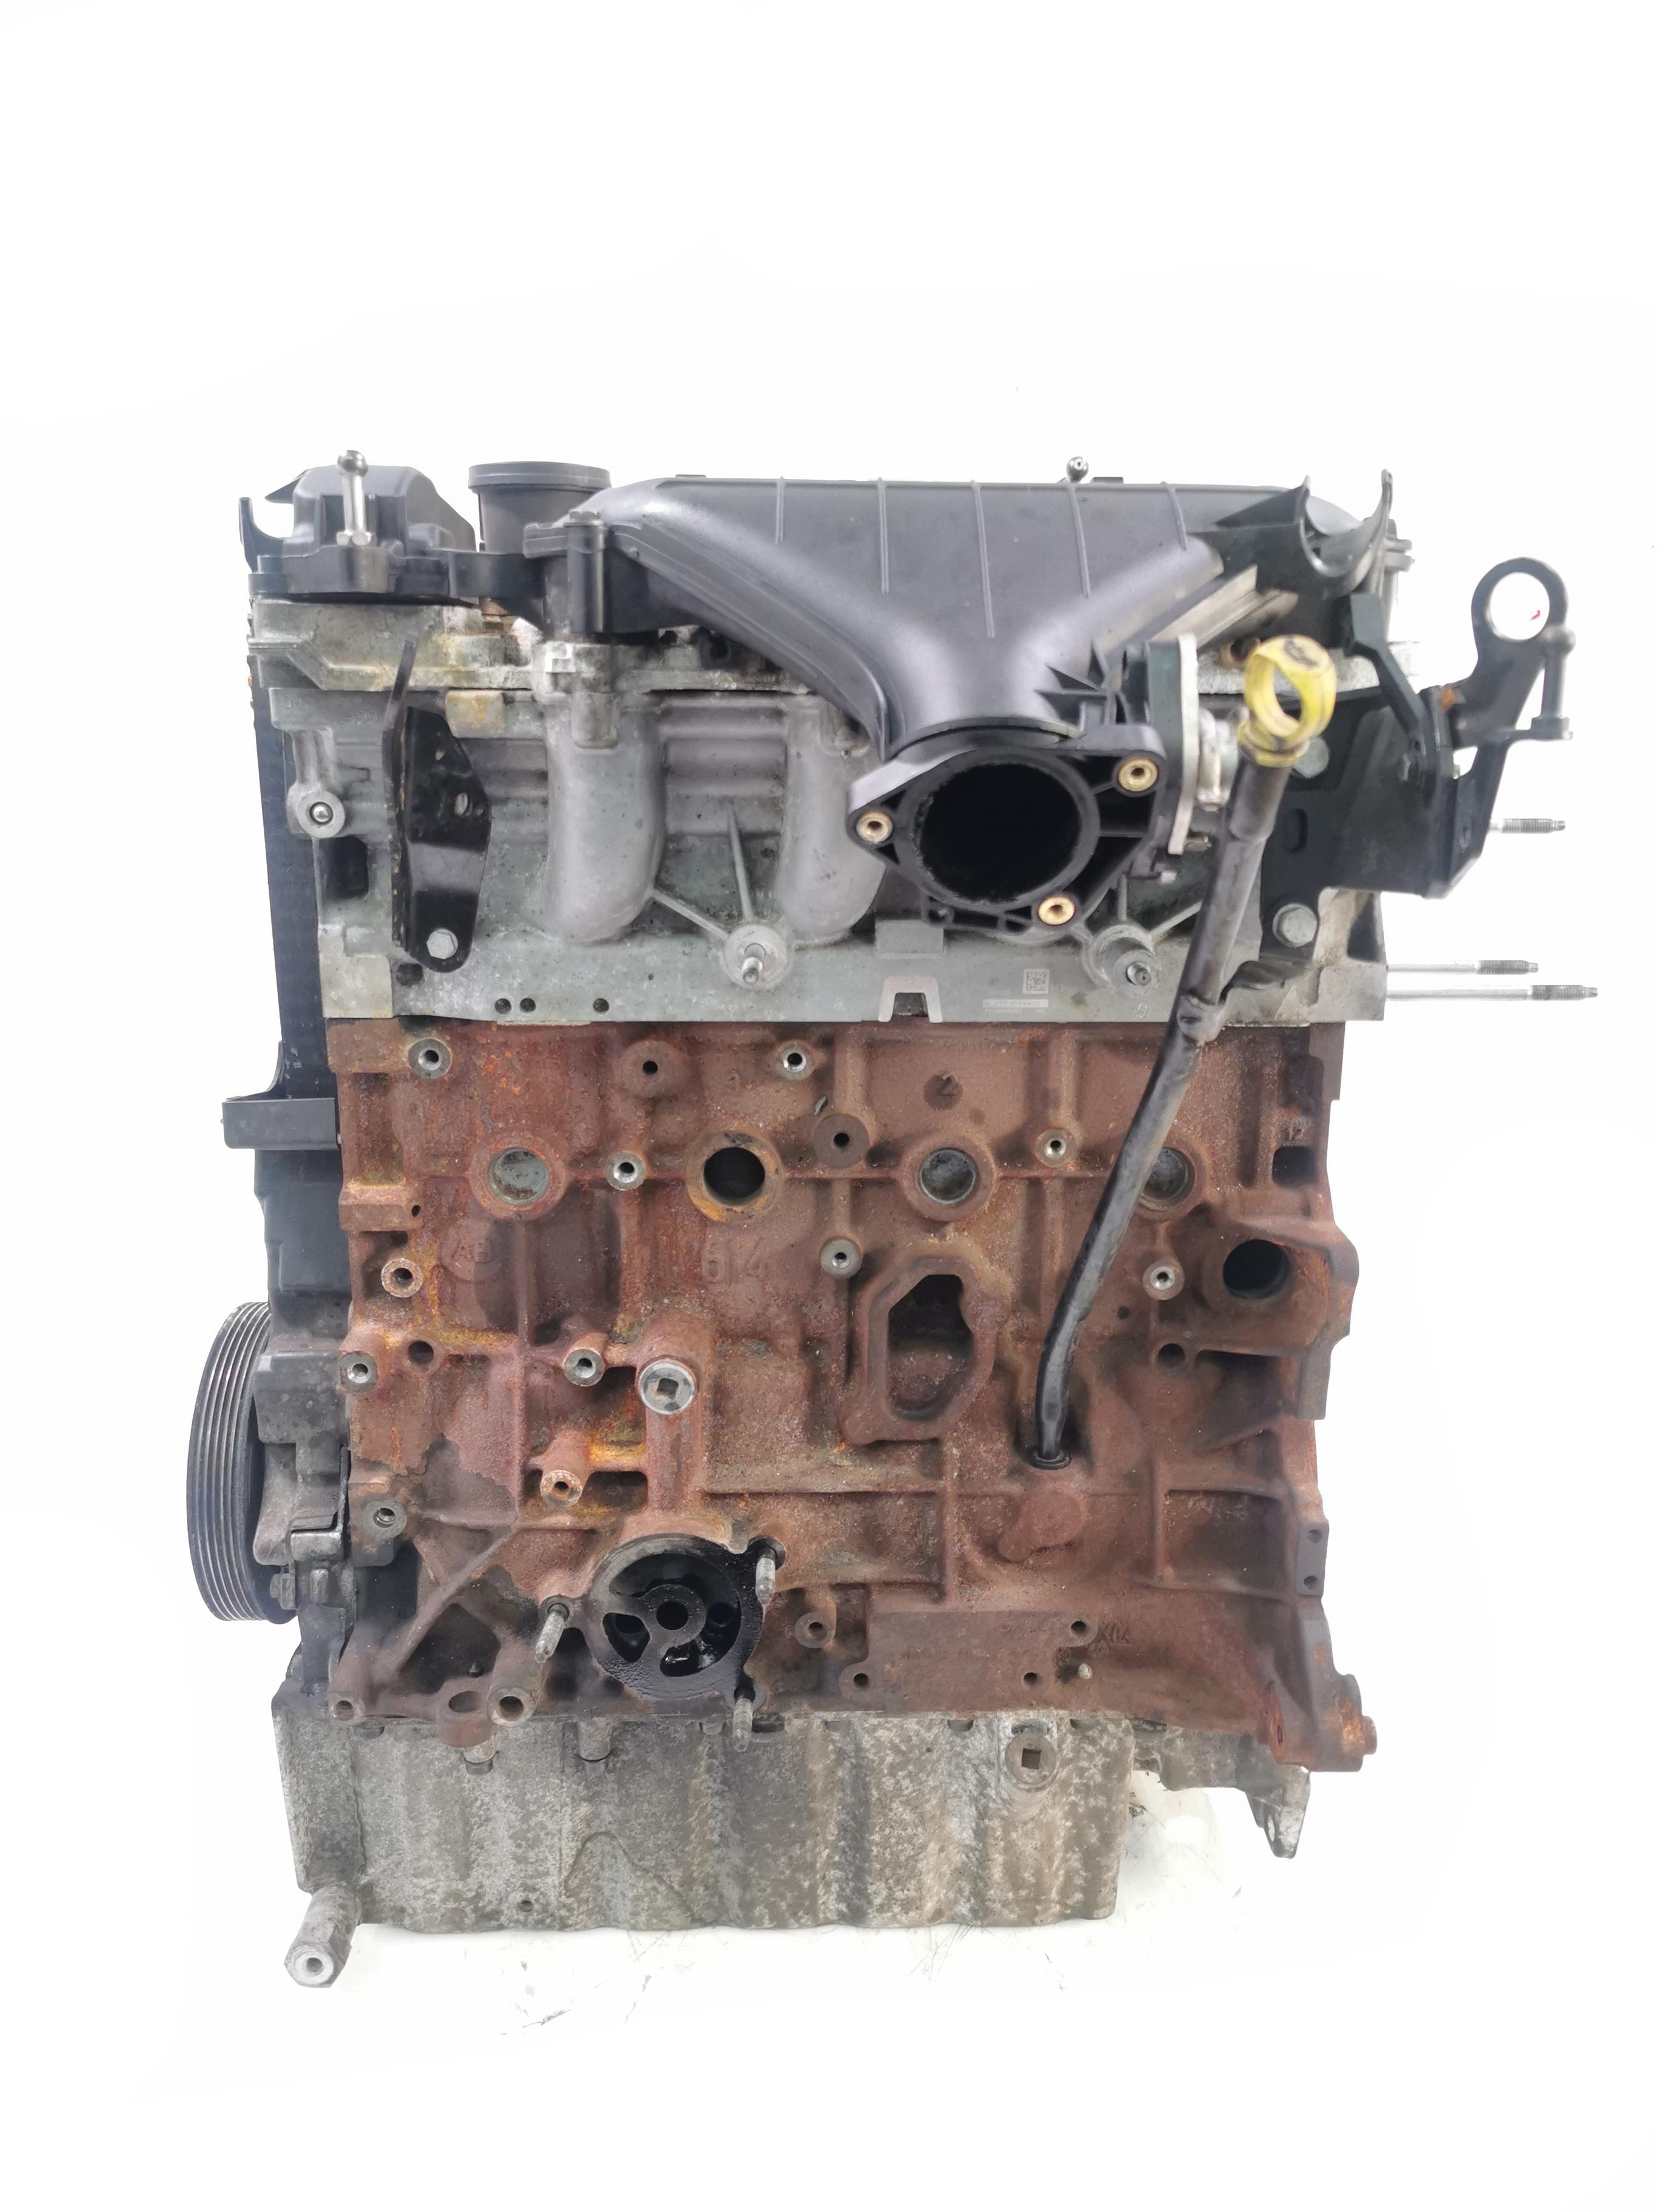 Motor Ford 2,0 TDCi QXWB 140 PS